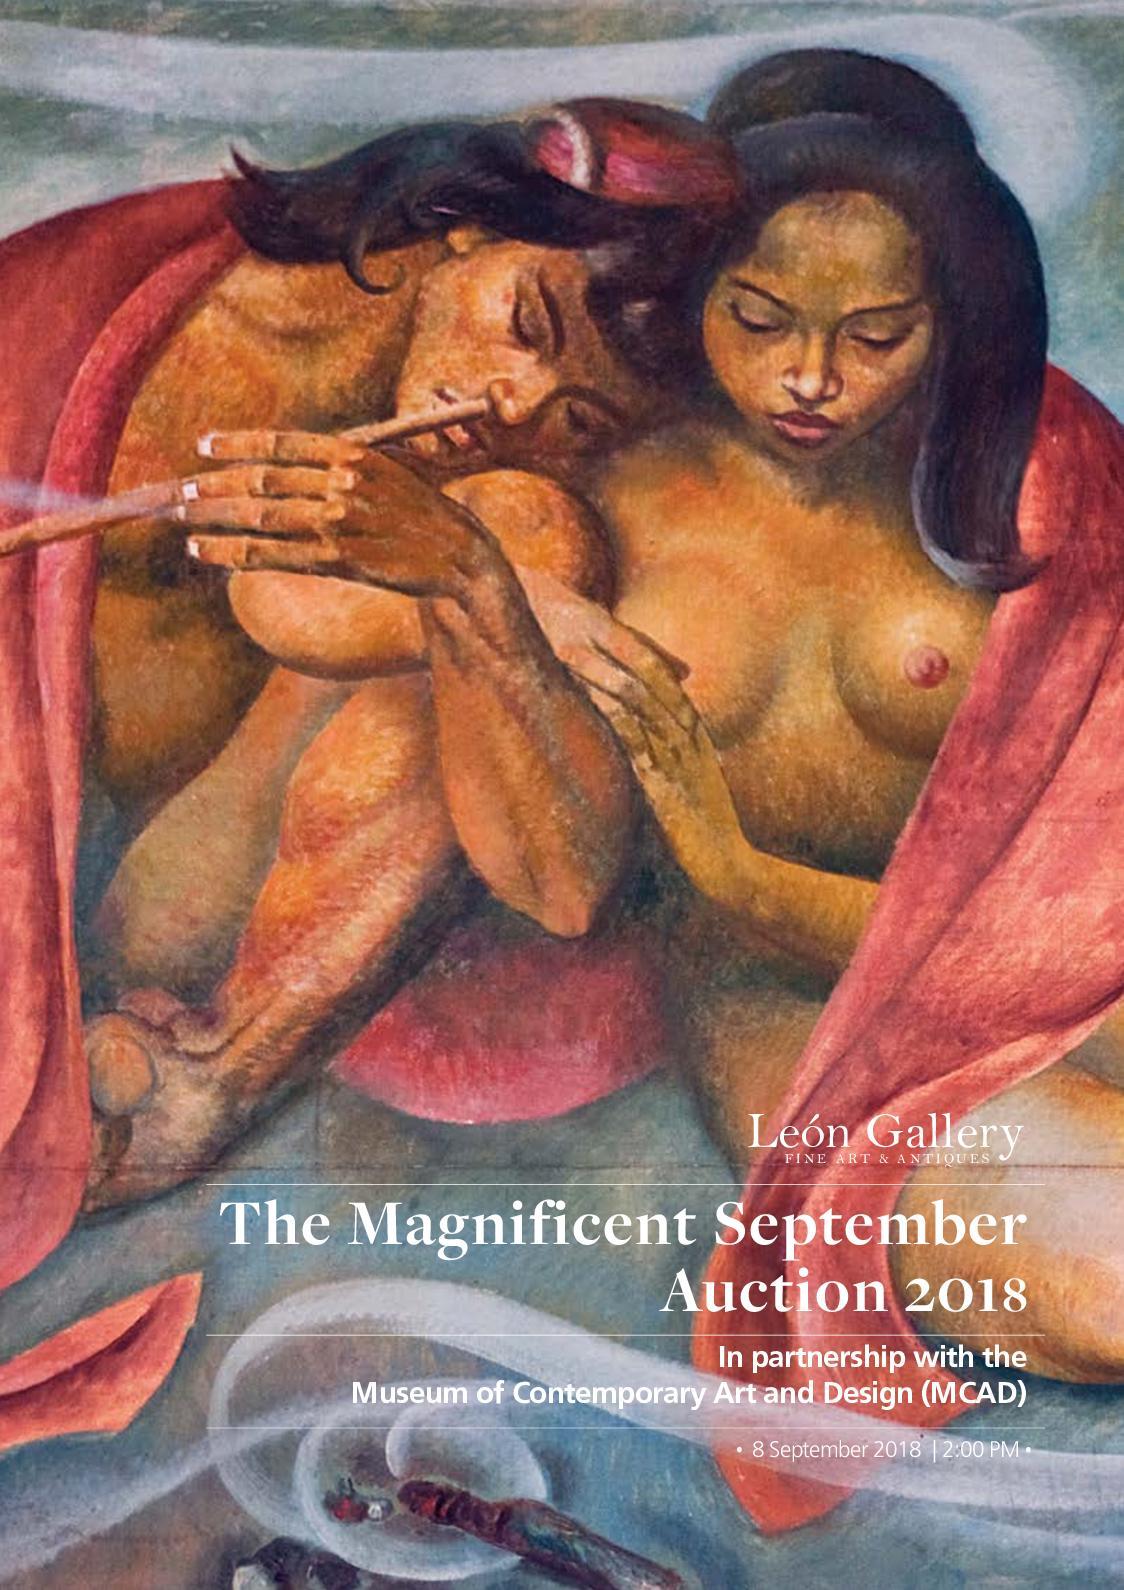 Ana Clara Nua Video calaméo - the magnificent september auction 2018